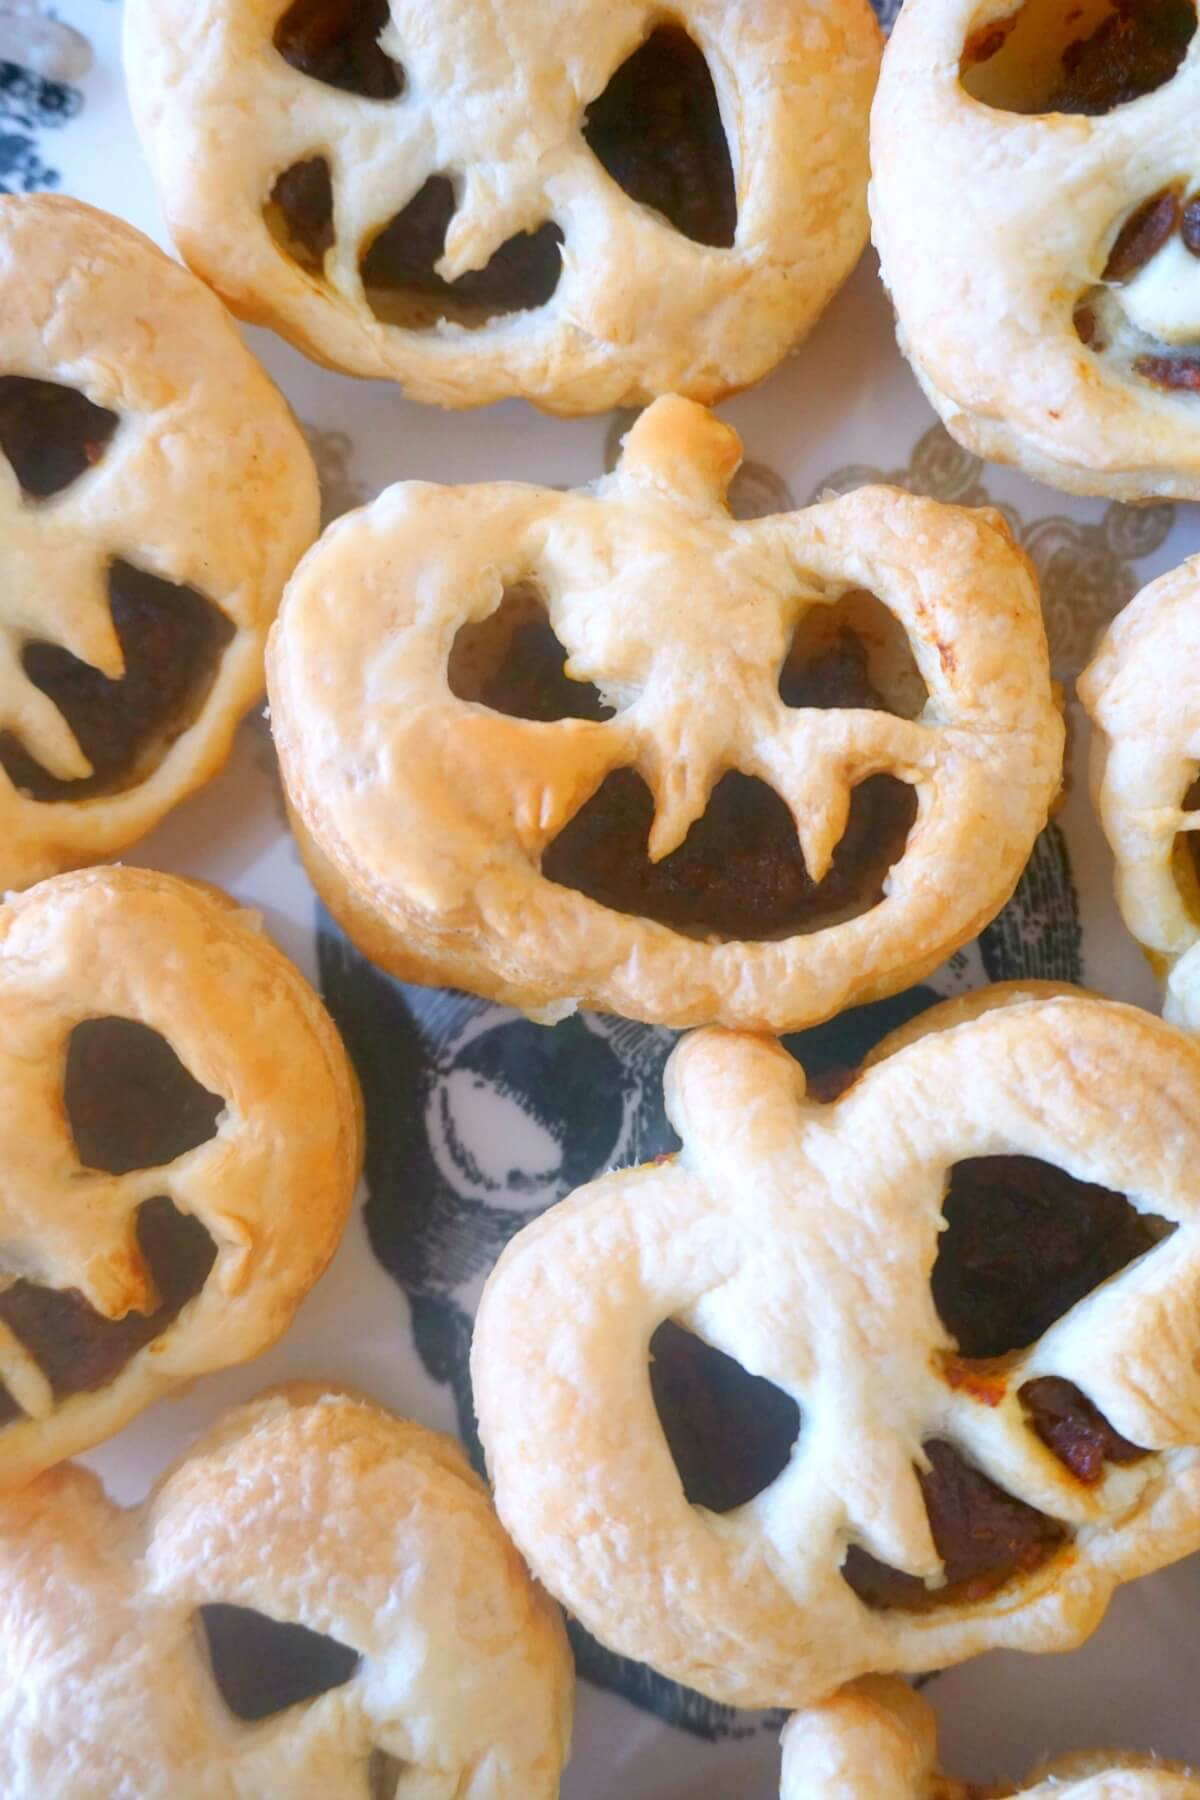 Close-up shoot of Jack O'Lantern pumpkin pies